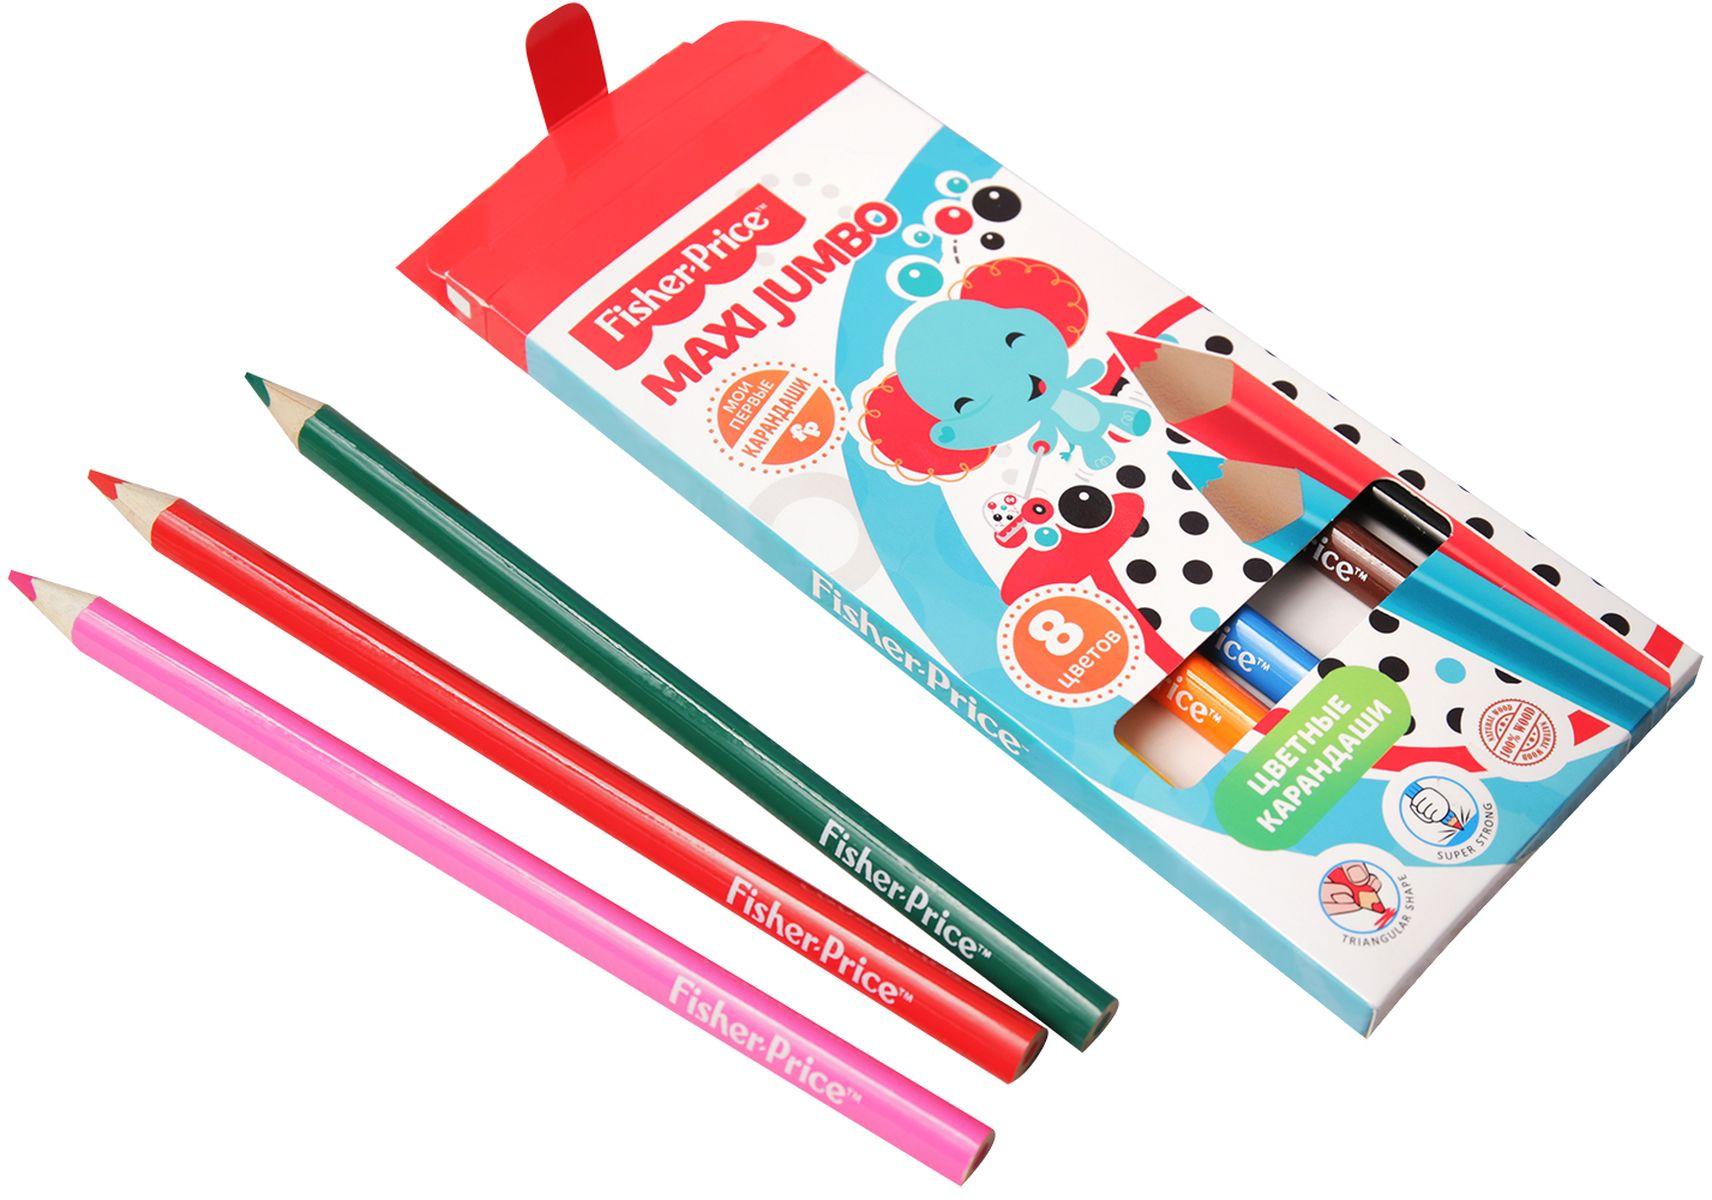 Mattel Набор цветных карандашей Maxi Jumbo Mattel Fisher Price 8 цветов карандаши bruno visconti набор карандашей цветных disney белоснежка 6 цветов